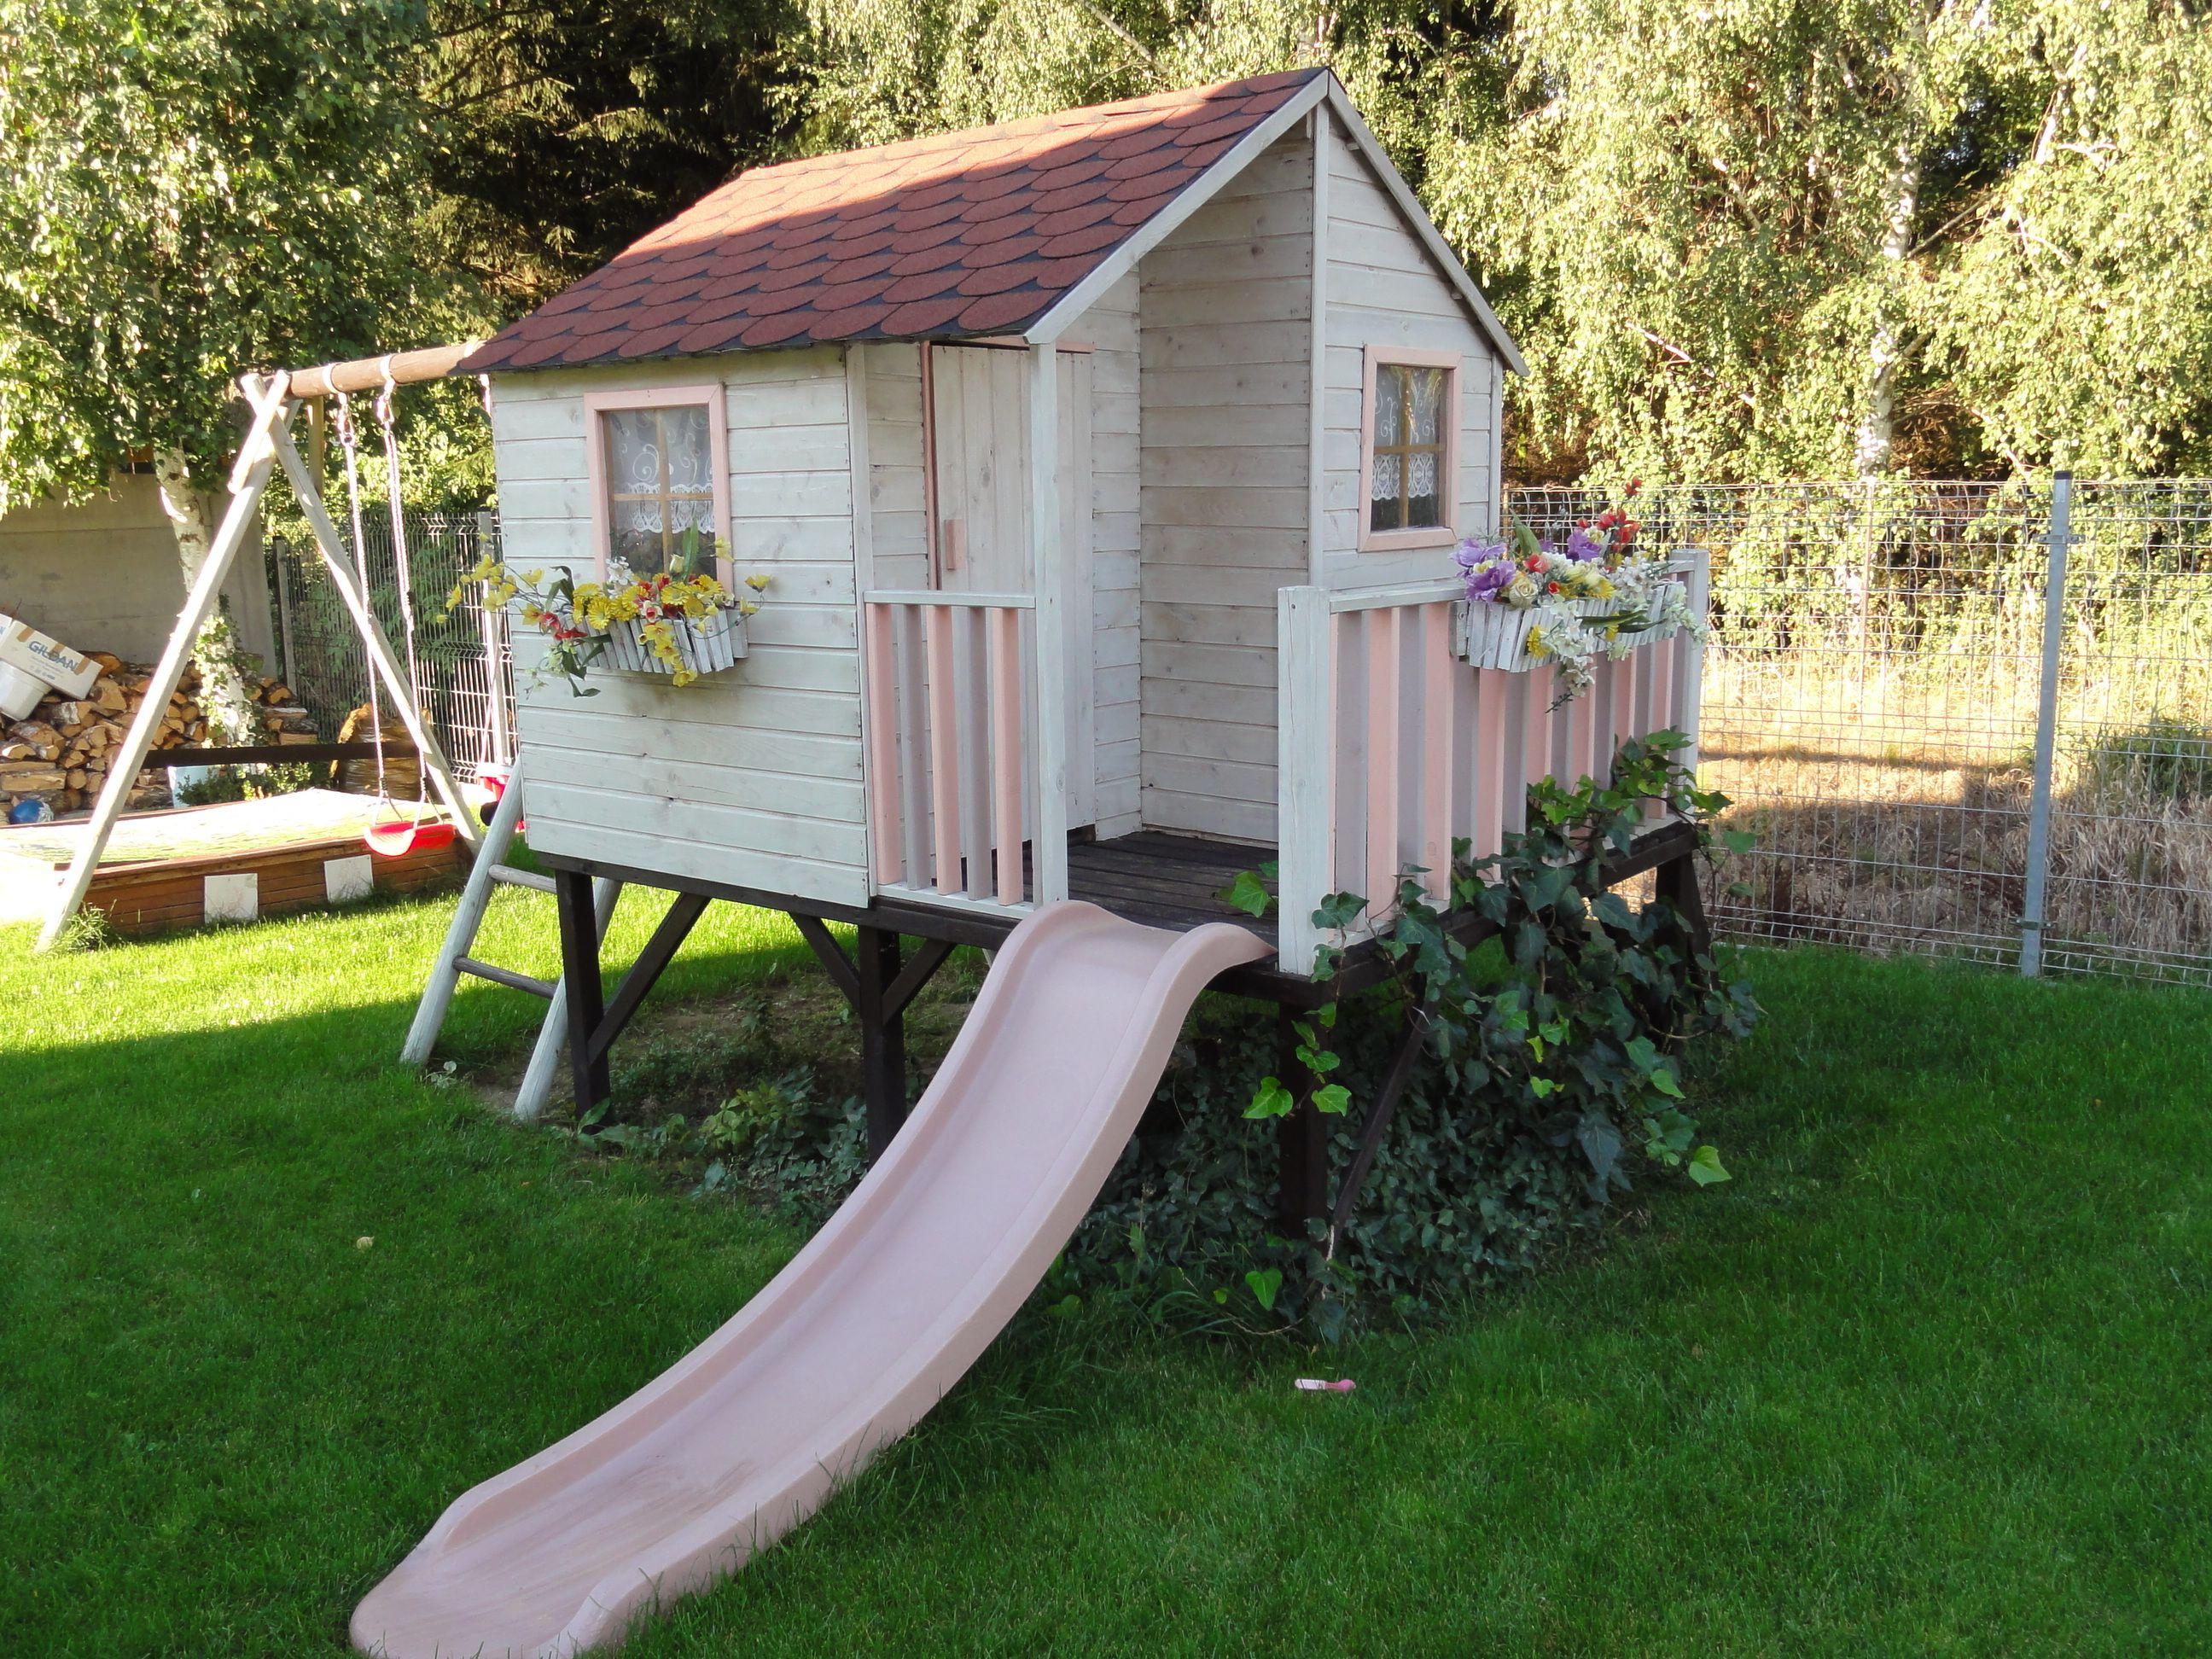 Domek Ogrodowy Dla Dzieci Jurek Ogrodosfera Pl Outdoor Structures Outdoor Garden